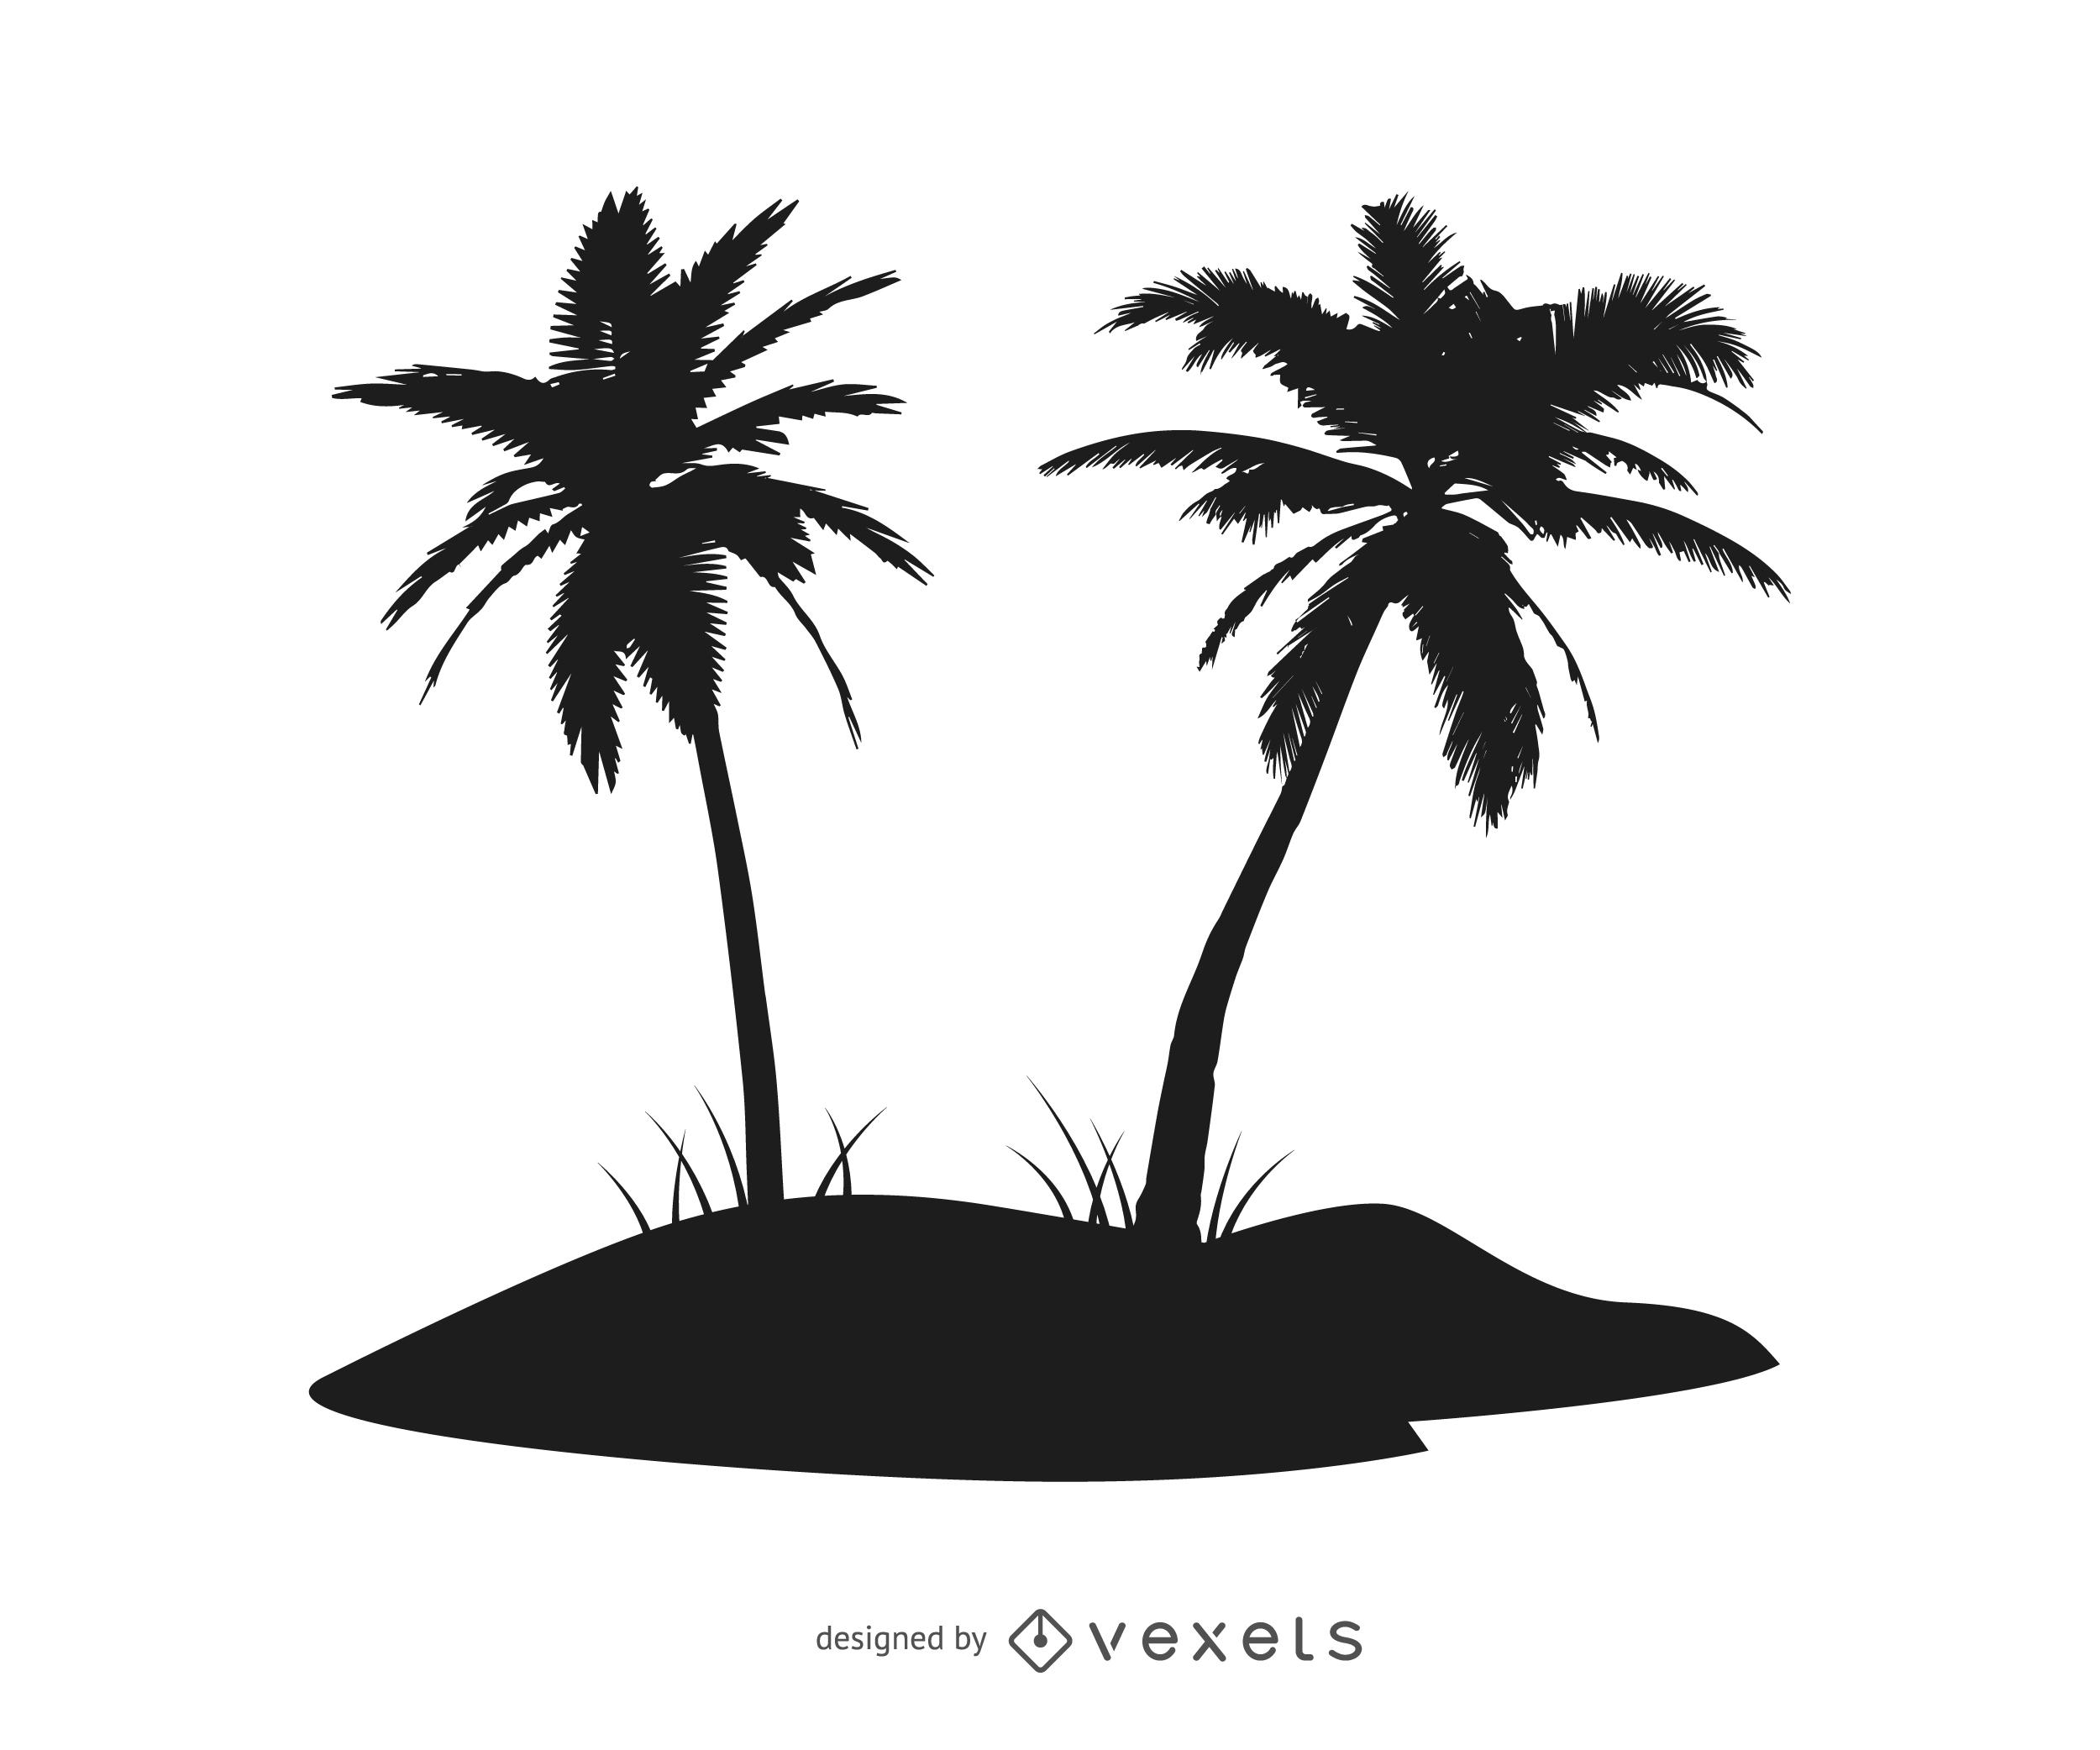 silhouette date palm tree - photo #32